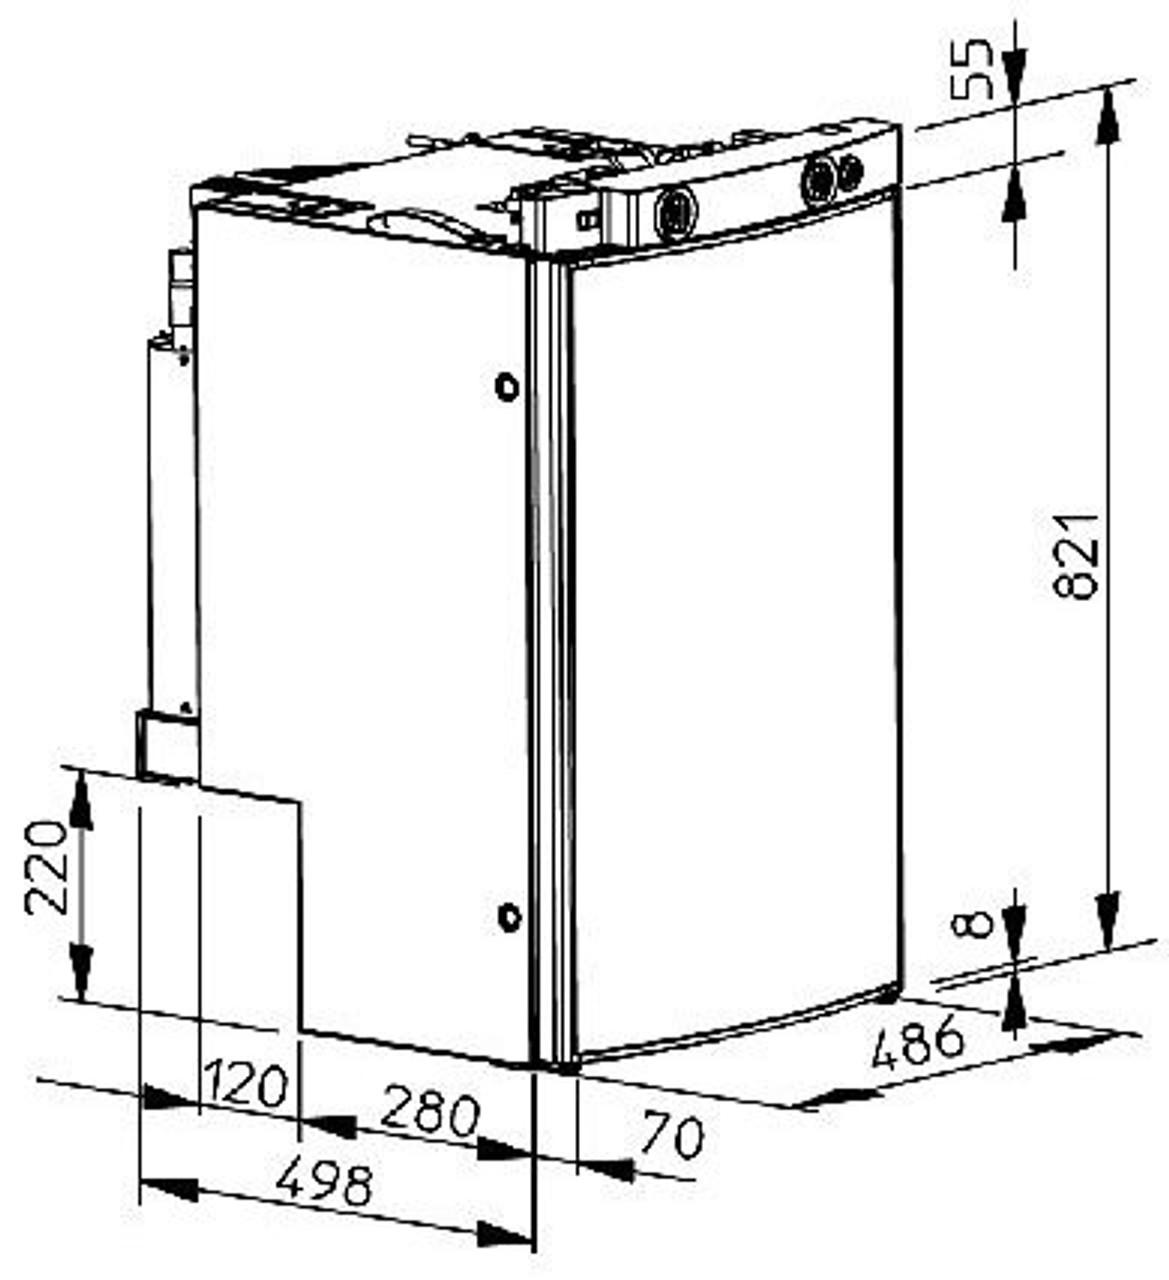 Dometic RMS8400 230v 12v LPG Gas Caravan Absorption Fridge  Dimensions